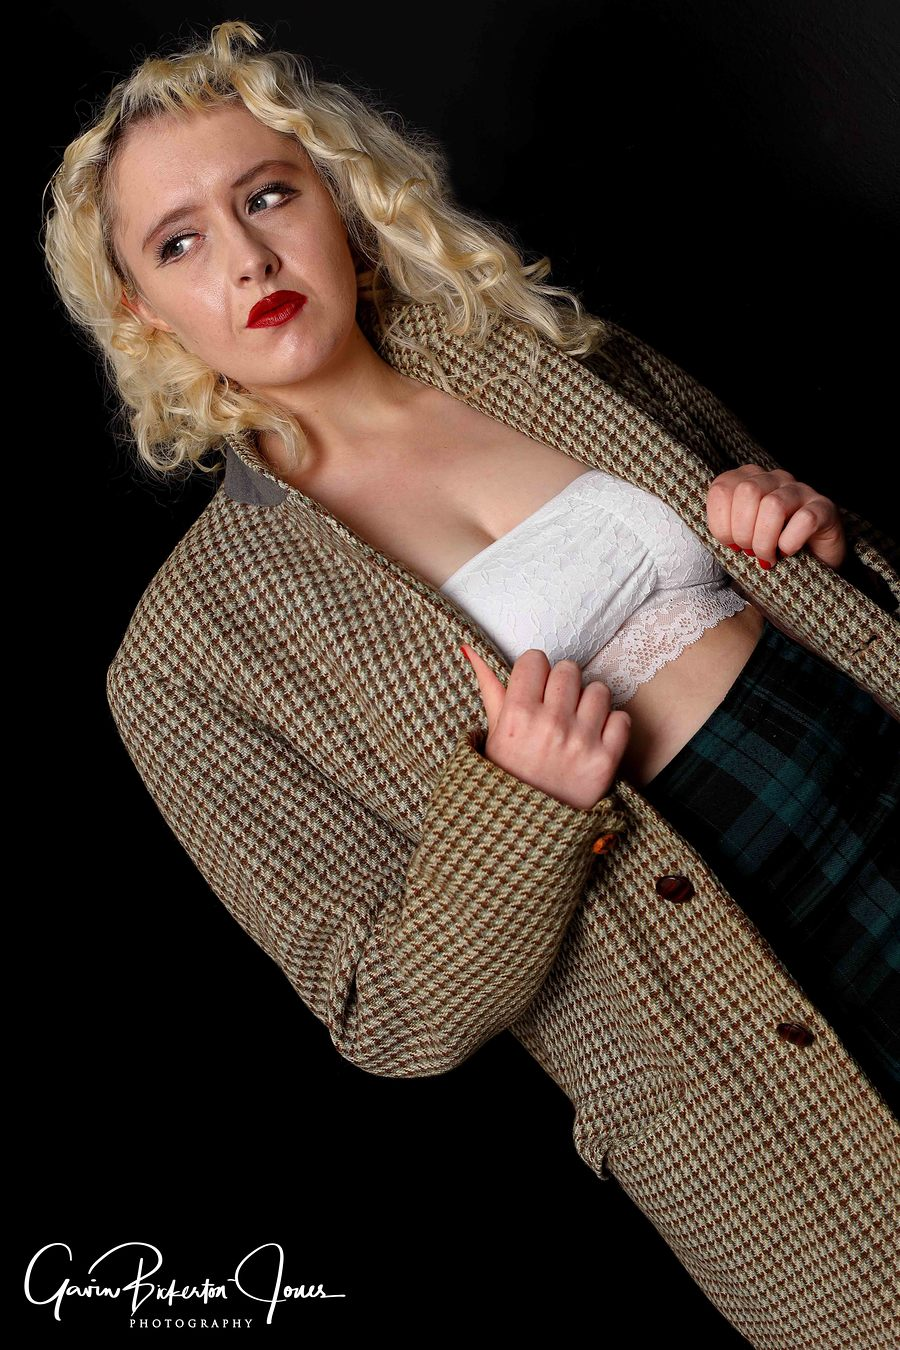 Edgy / Photography by GavinBJ, Model Maretta Vergette, Makeup by Maretta Vergette, Stylist Maretta Vergette, Taken at Butterfly Studios Norwich, Hair styling by Maretta Vergette / Uploaded 18th November 2019 @ 02:28 PM